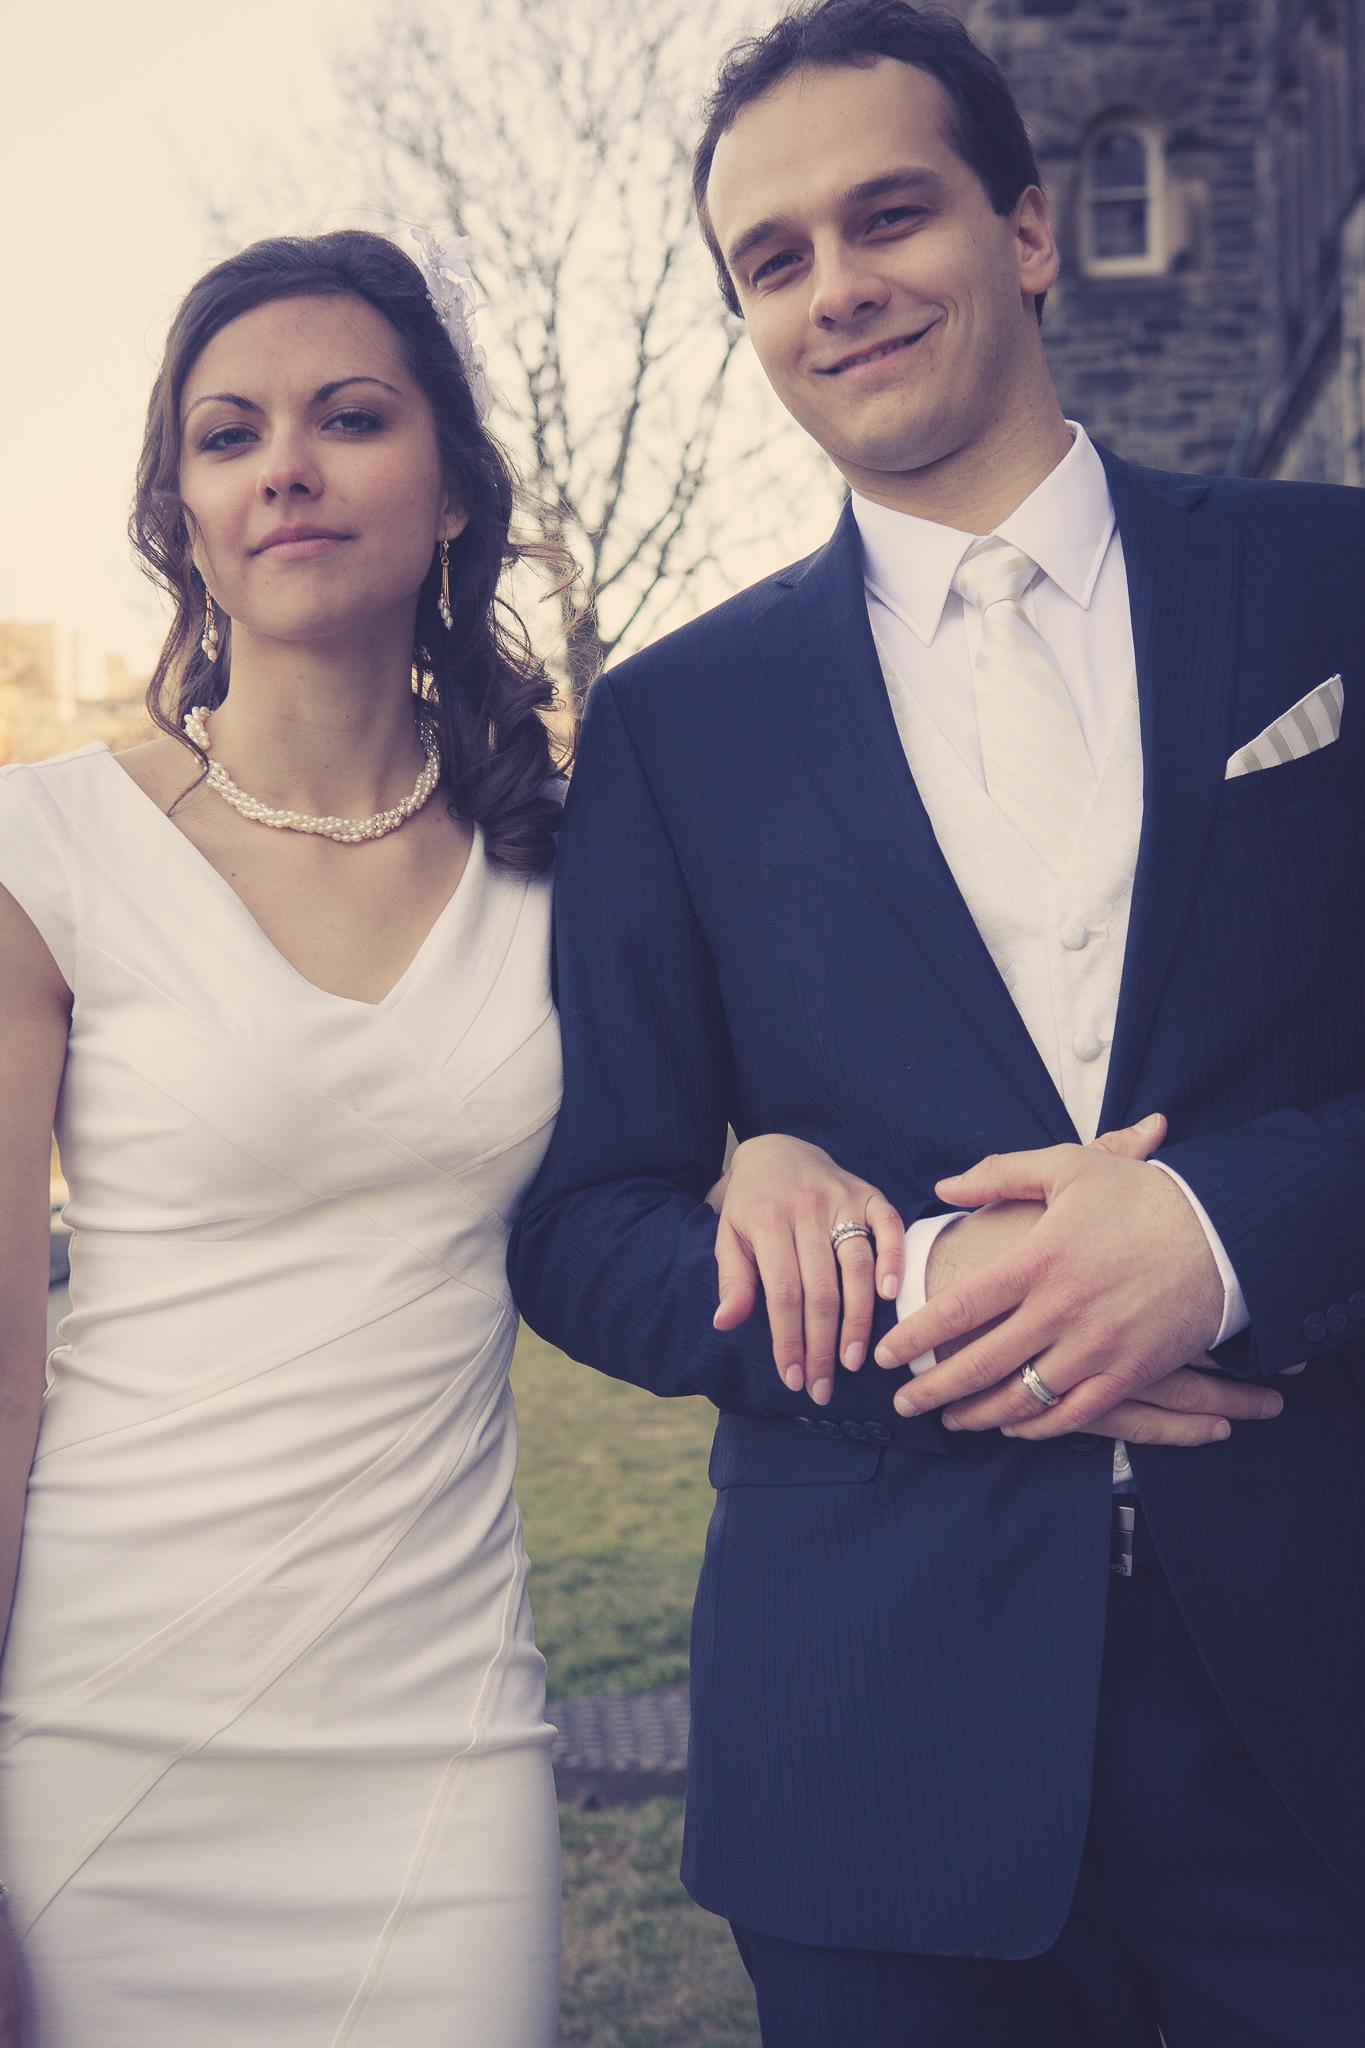 Toronto Wedding Photography - Zoya & Alexei -41.jpg